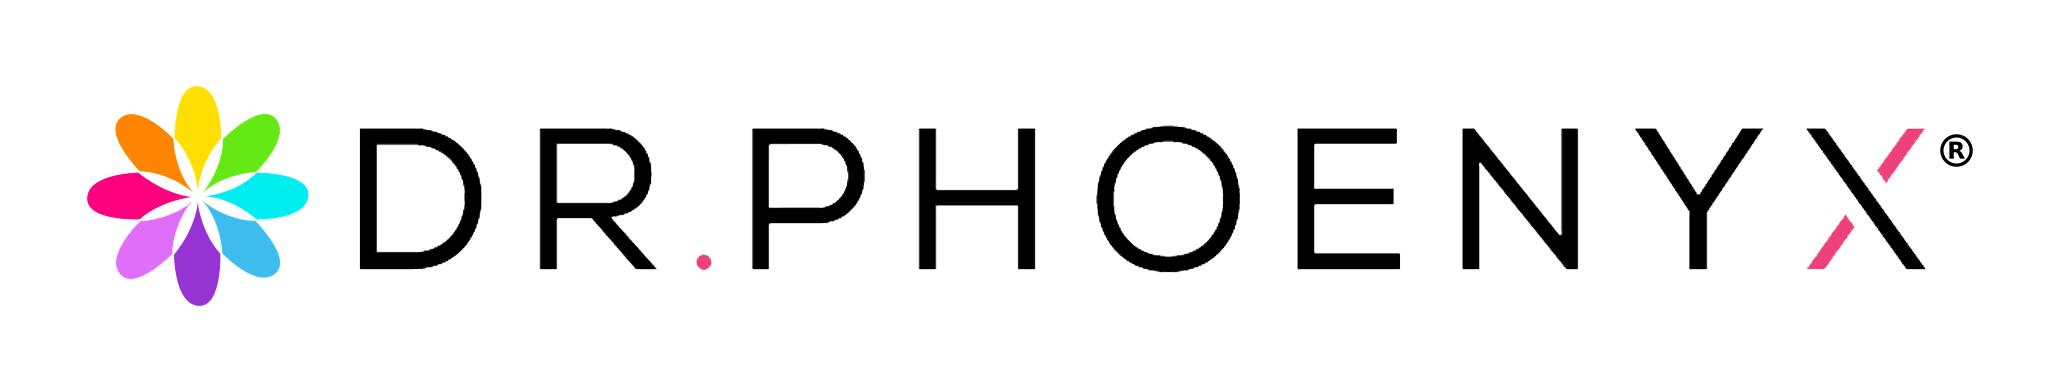 Dr. Phoenyx